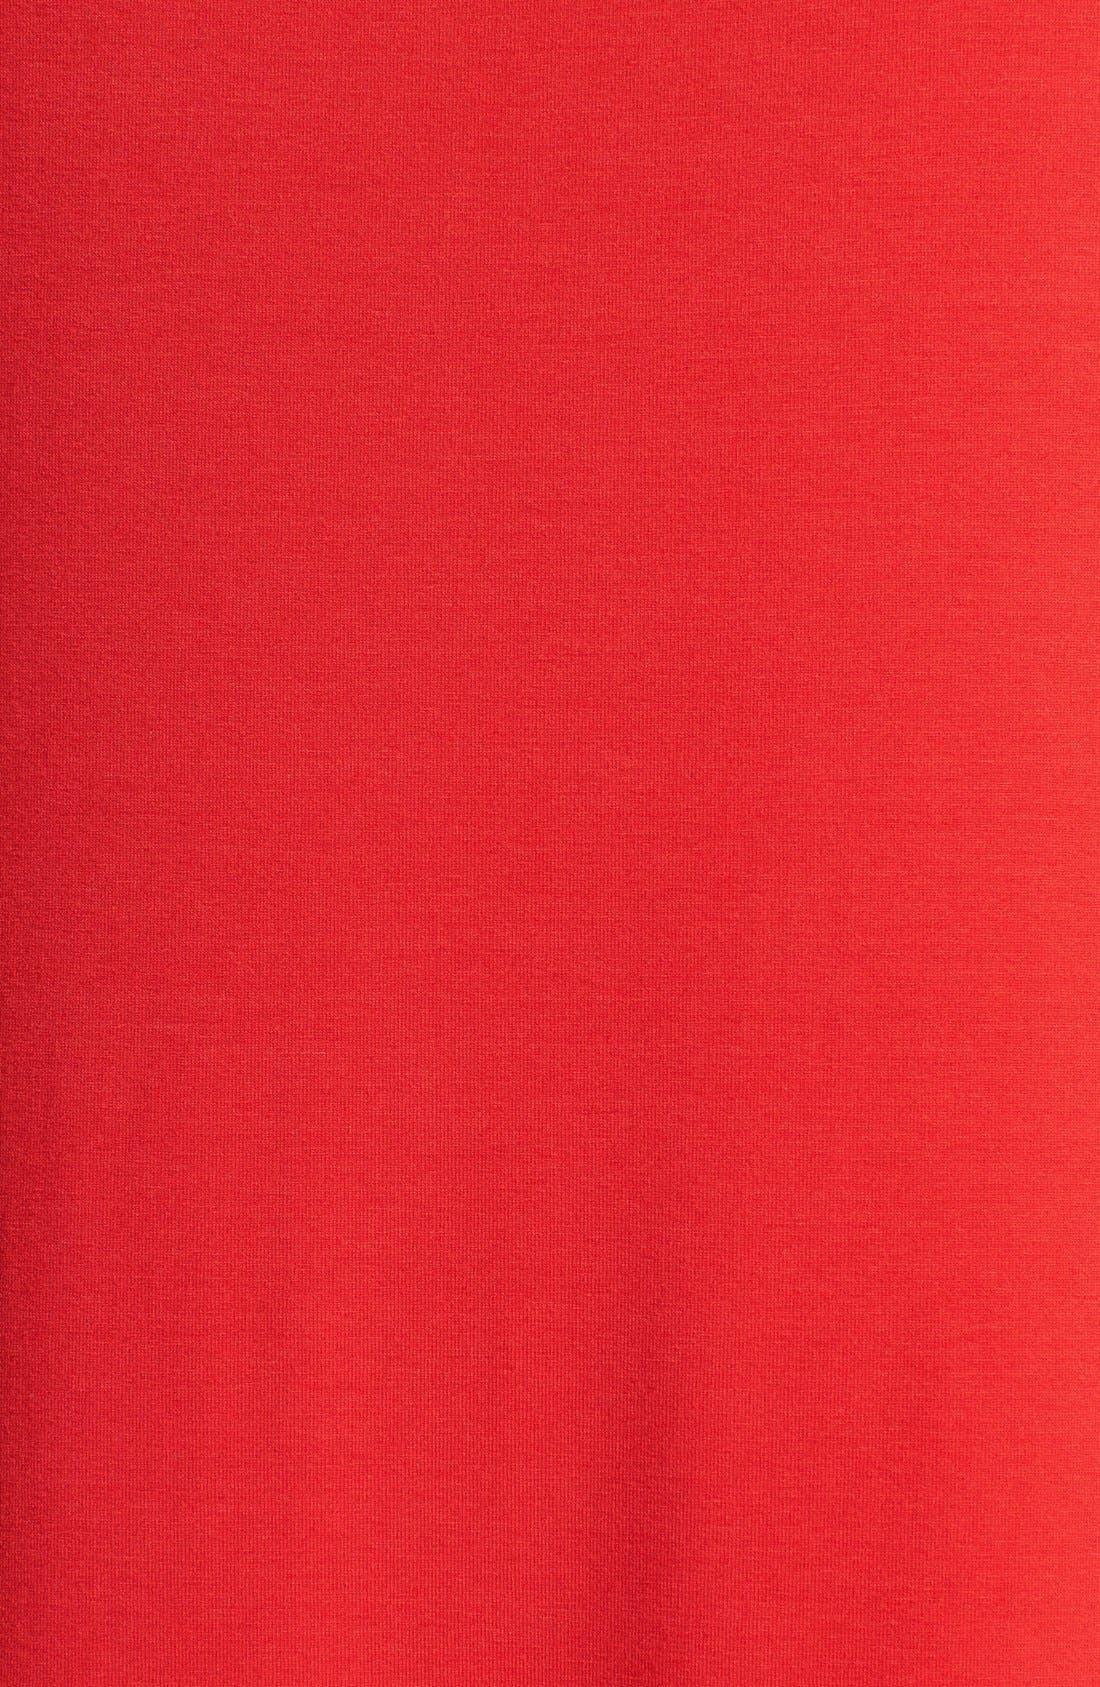 Alternate Image 3  - Eileen Fisher Jersey Maxi Dress